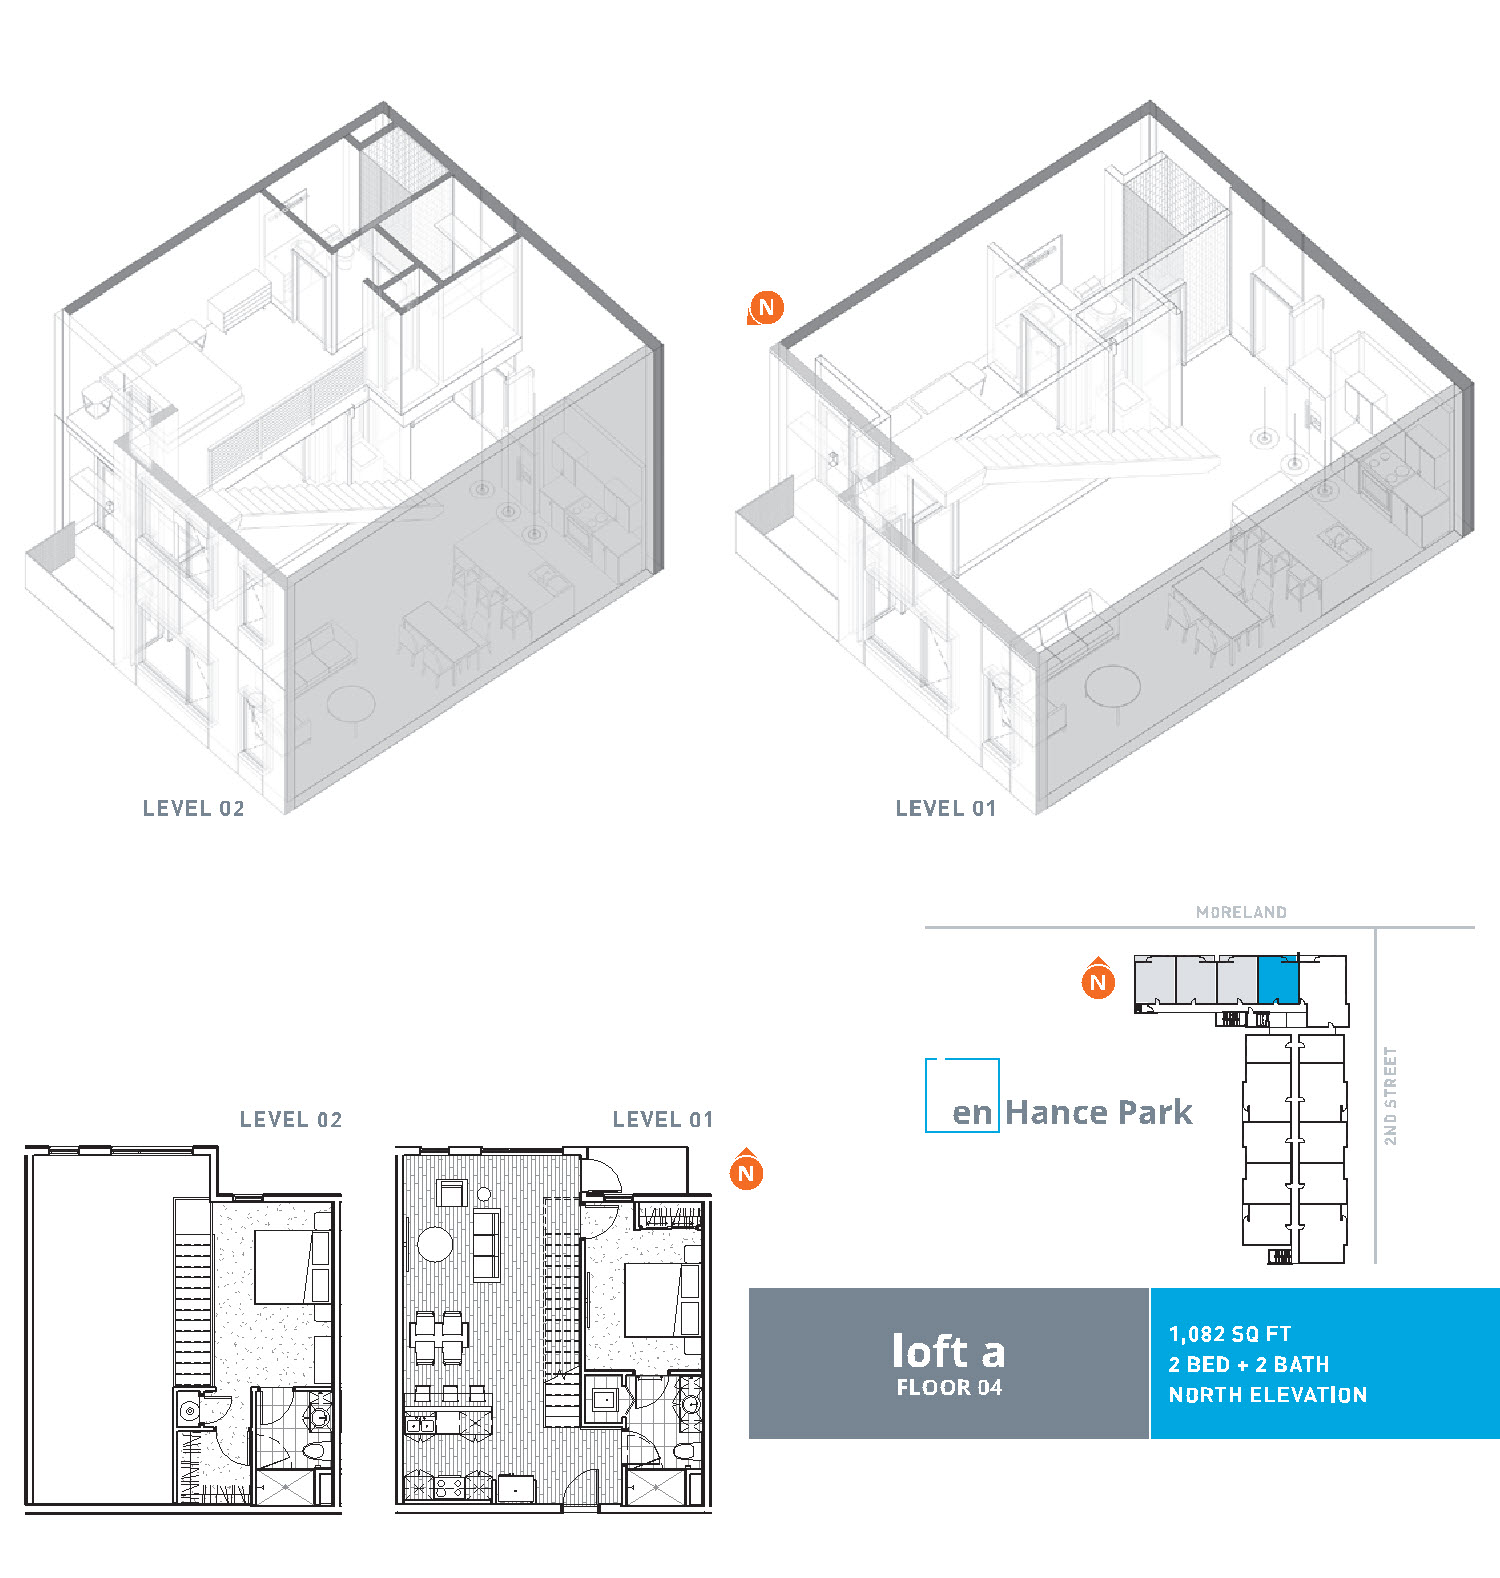 En hance park condo floor plan loft a 2bd